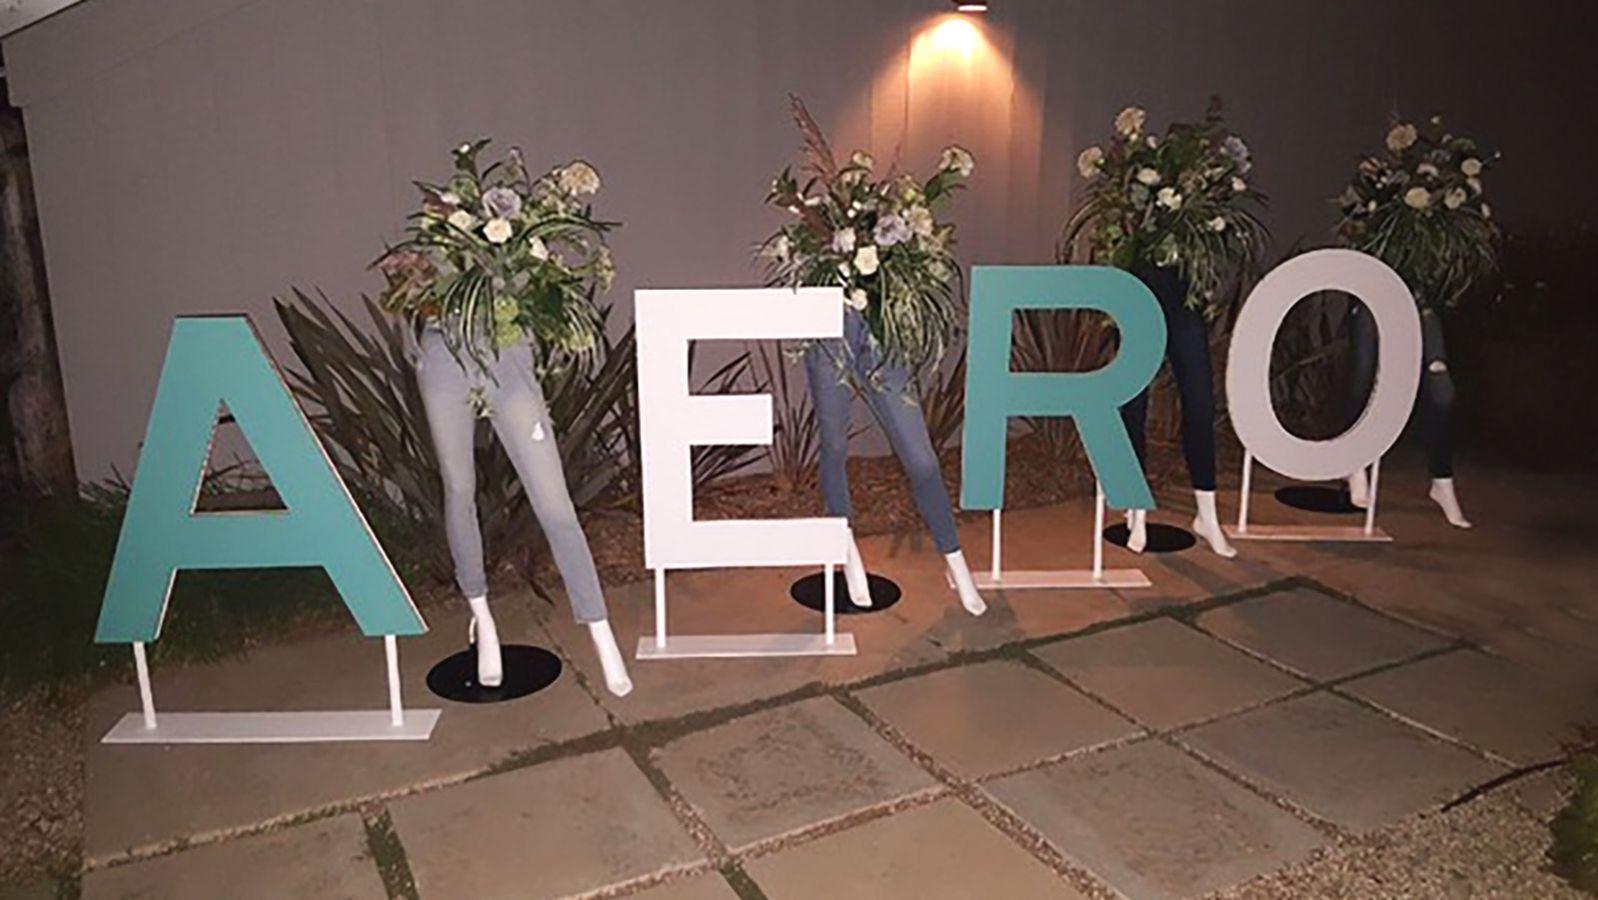 aeropostale 3d letters